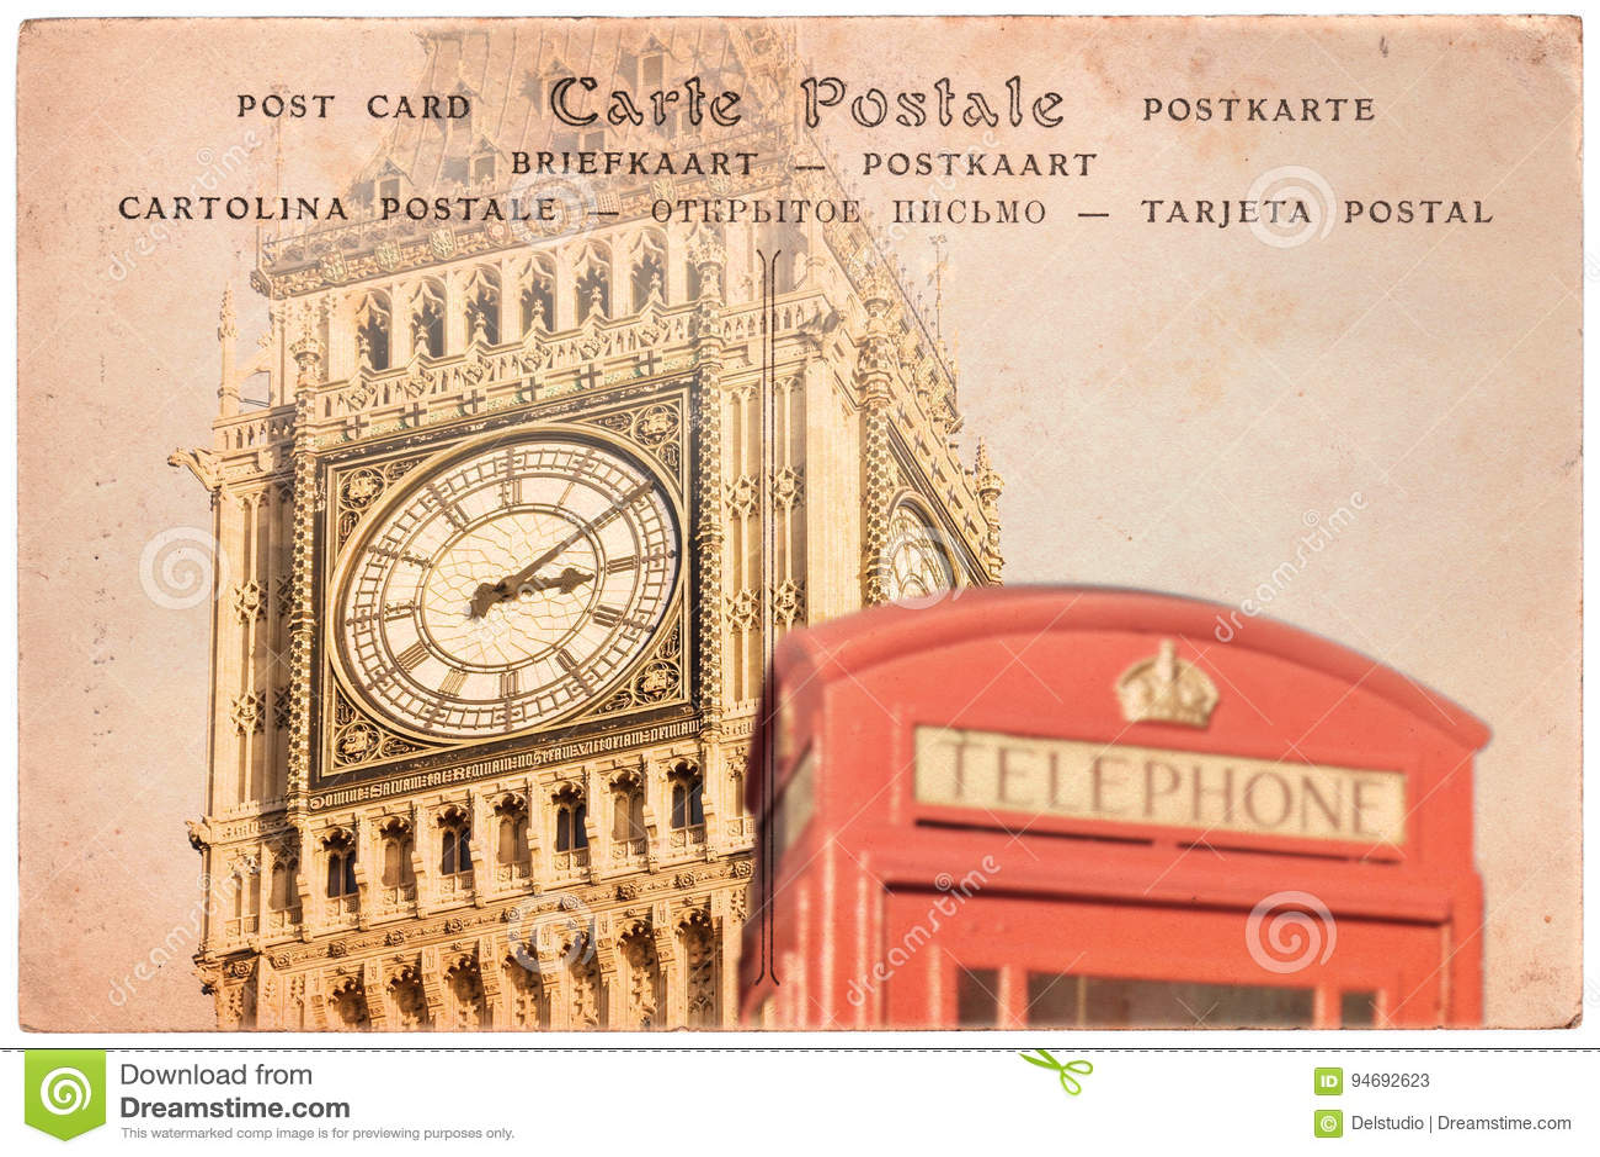 Big Ben και ένας κόκκινος αγγλικός τηλεφωνικός θάλαμος στο Λονδίνο, UK, κολάζ στο εκλεκτής ποιότητας υπόβαθρο καρτών σεπιών, κάρτ